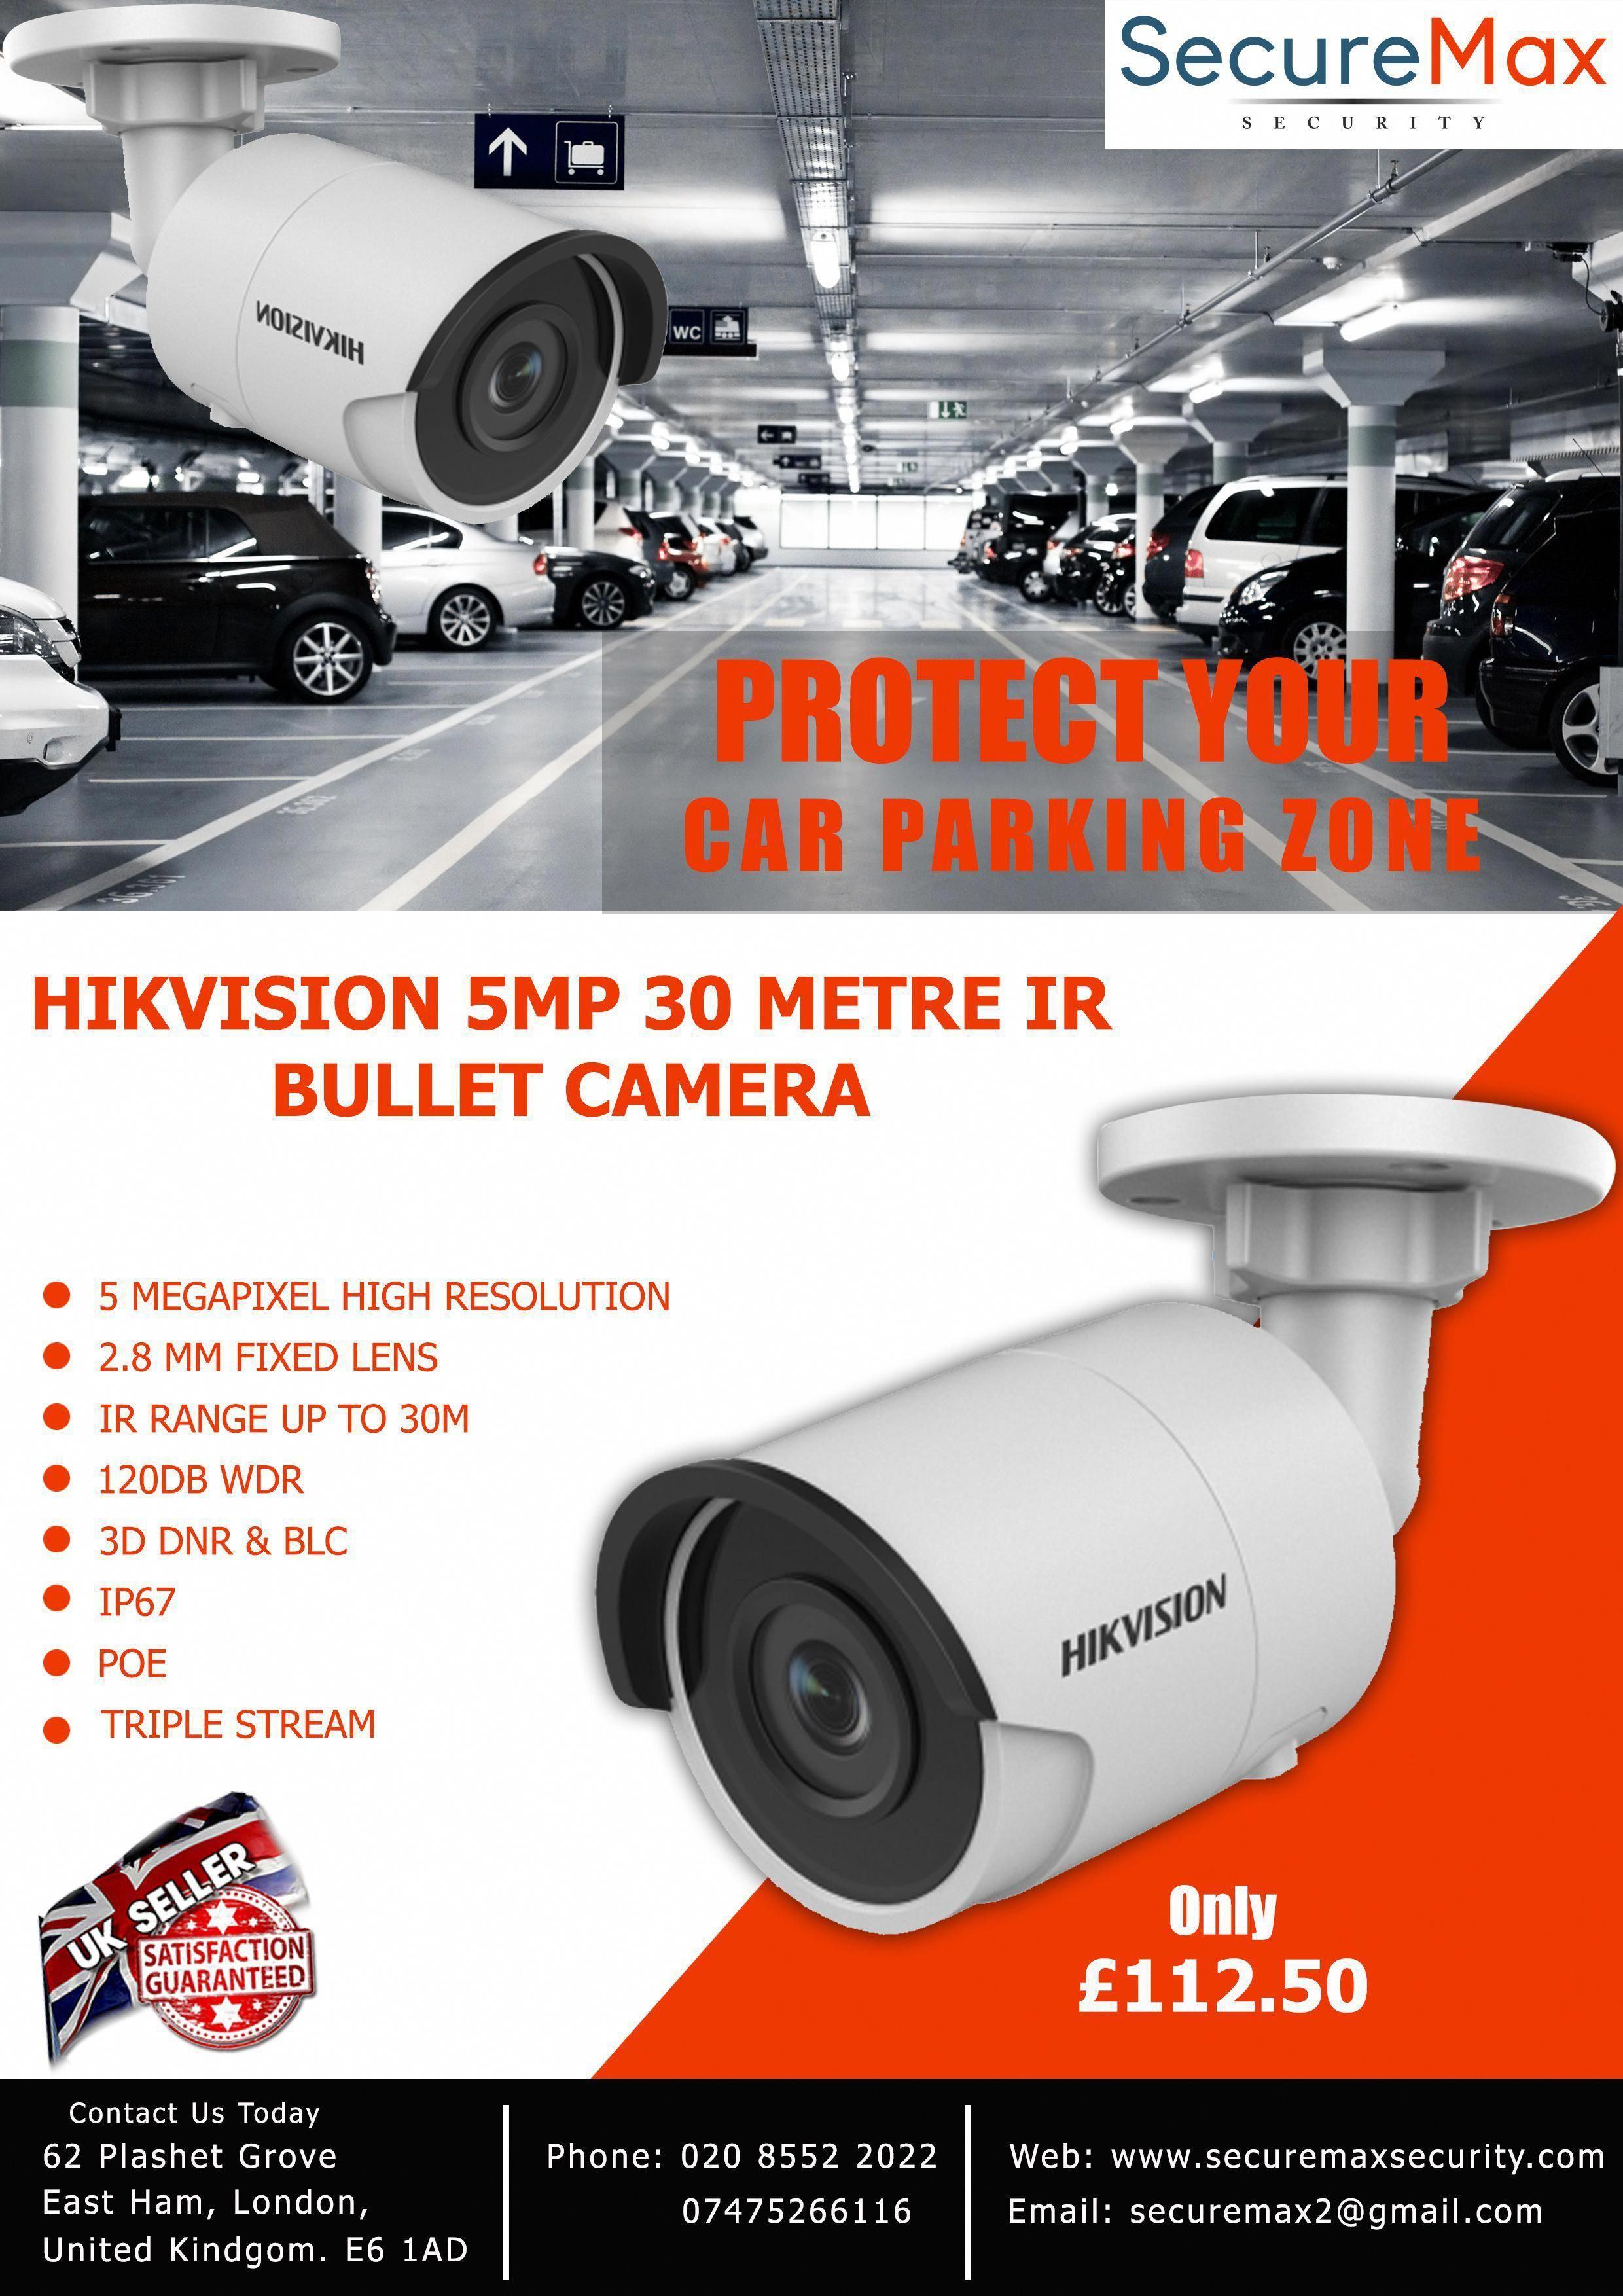 Http Www Alarm Security Us Securitycameras Homesecuritysystems Homesecuritycameras Wi Security Cameras For Home Wireless Home Security Systems Bullet Camera